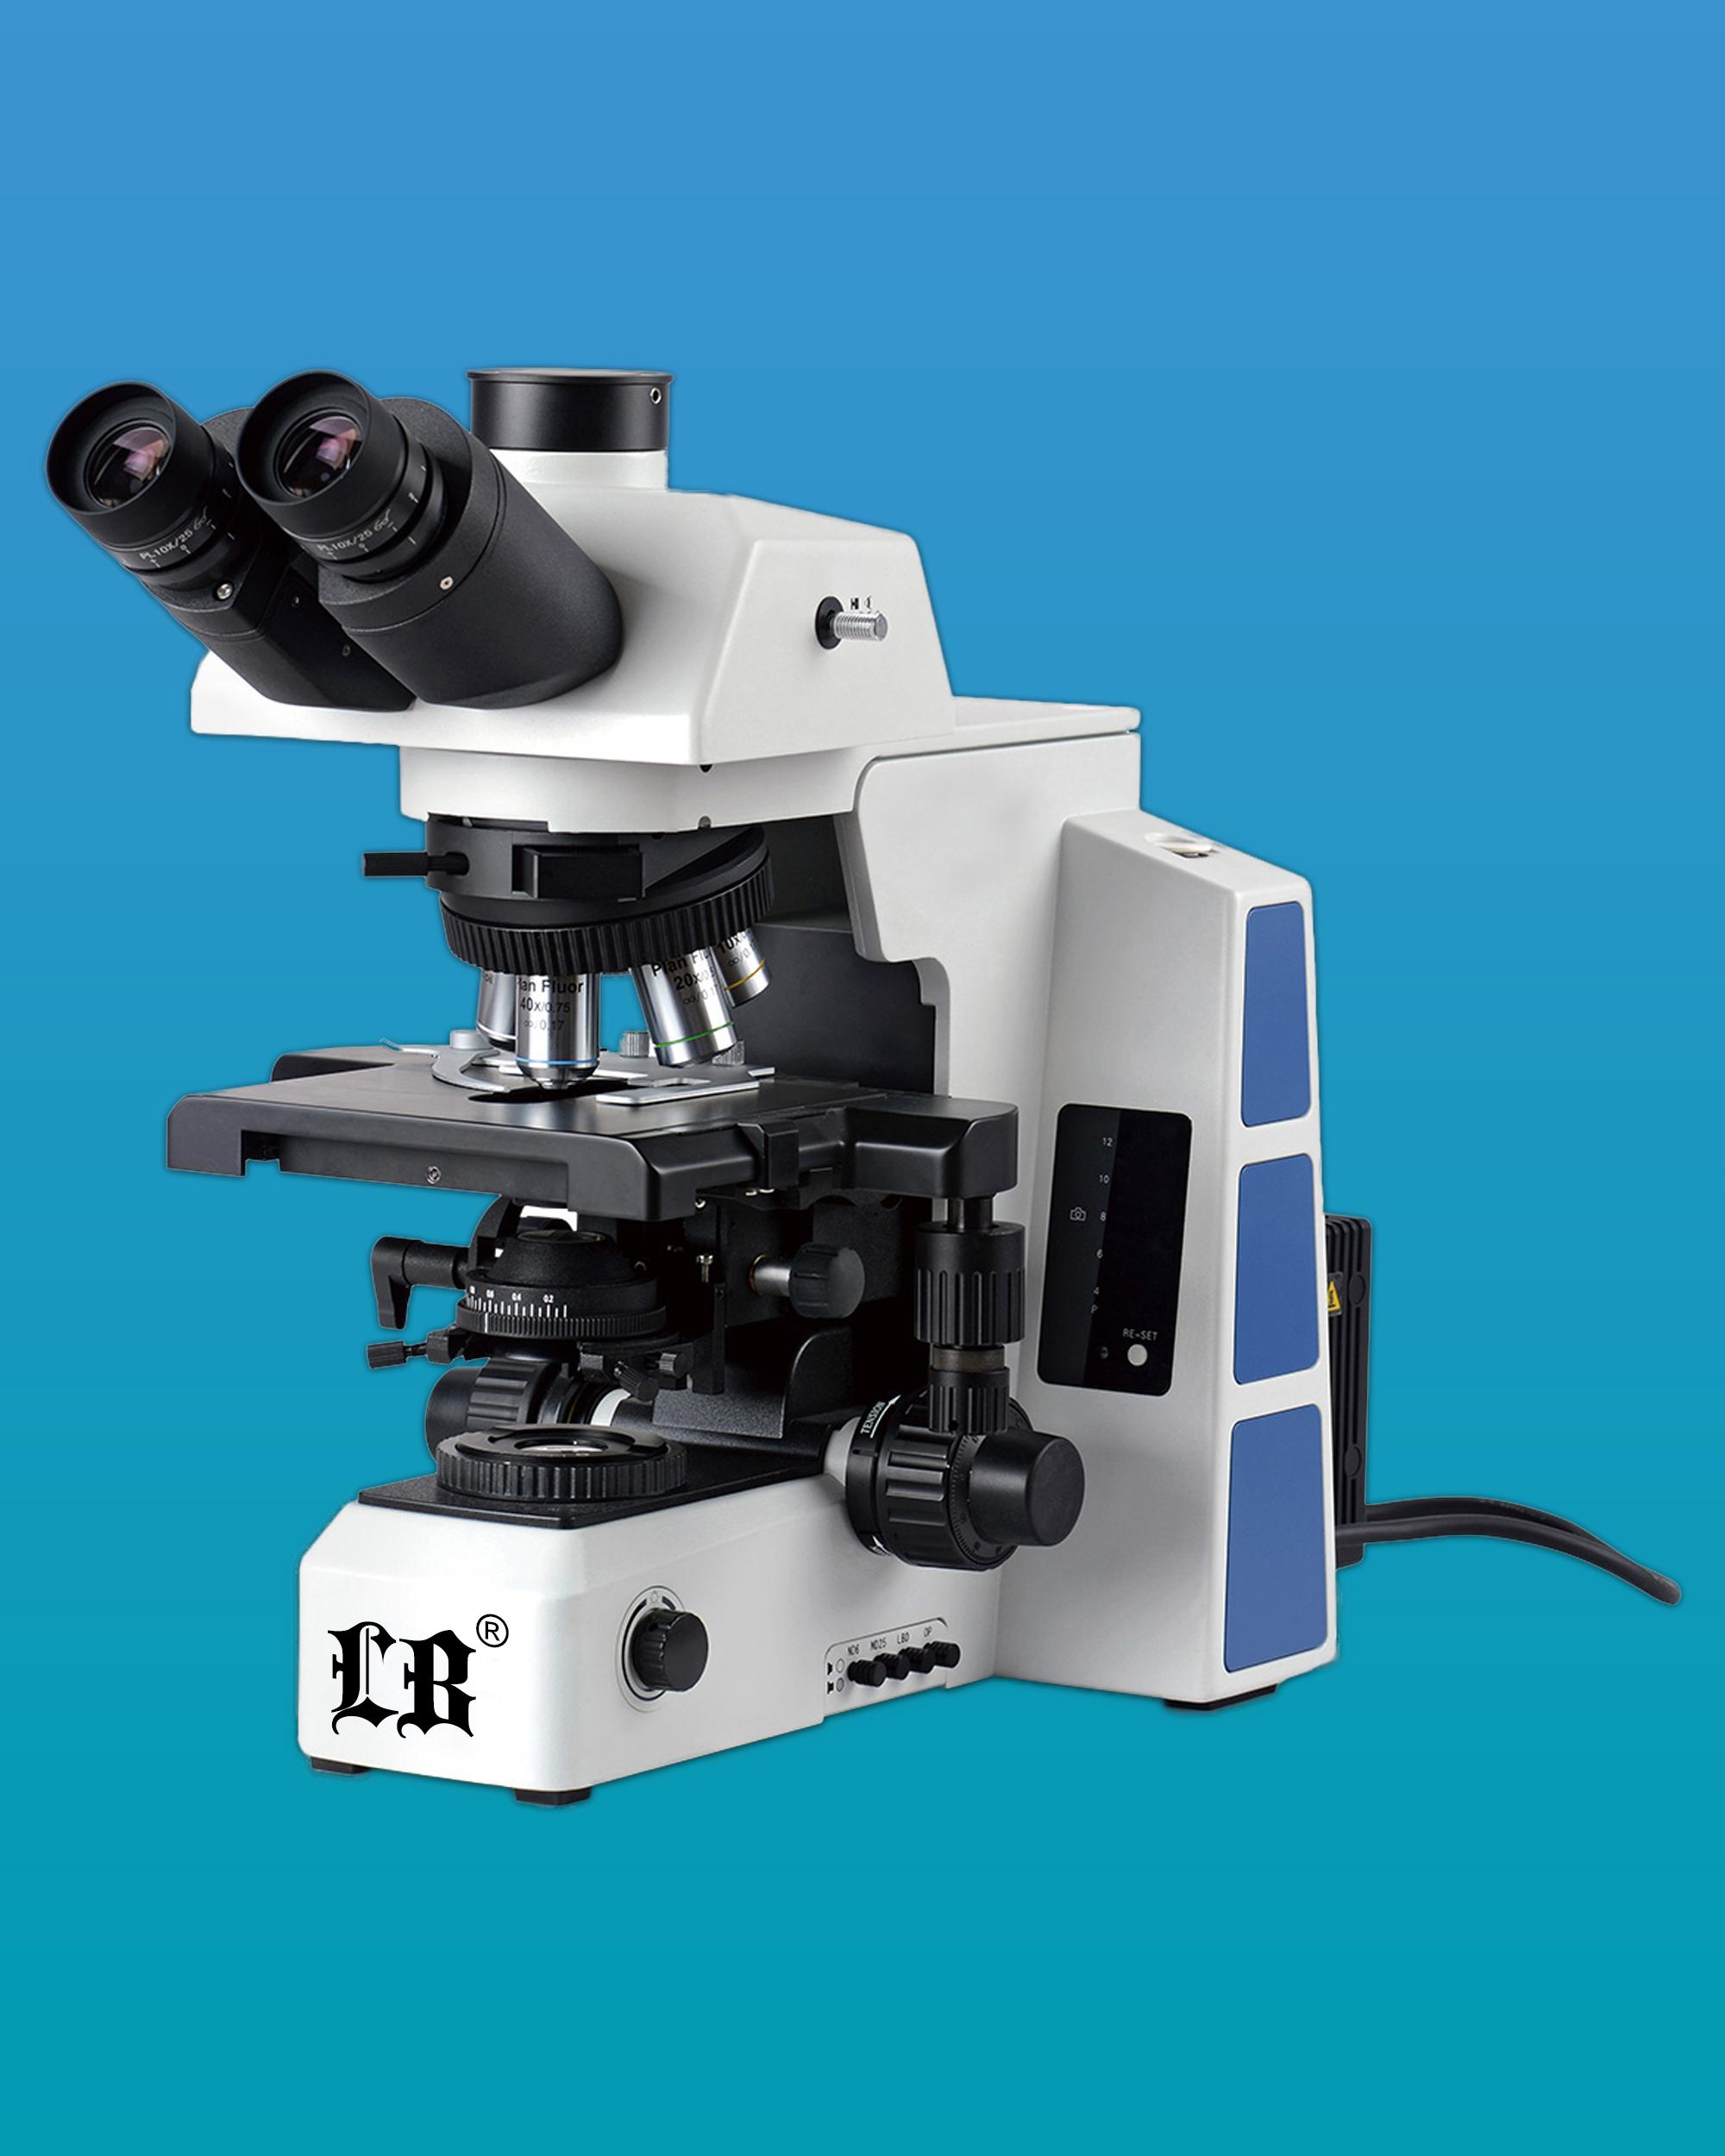 [LB-284] Research Trinocular Biological Microscope w/ Plan Semi-Apochromatic Fluorescent Objectives